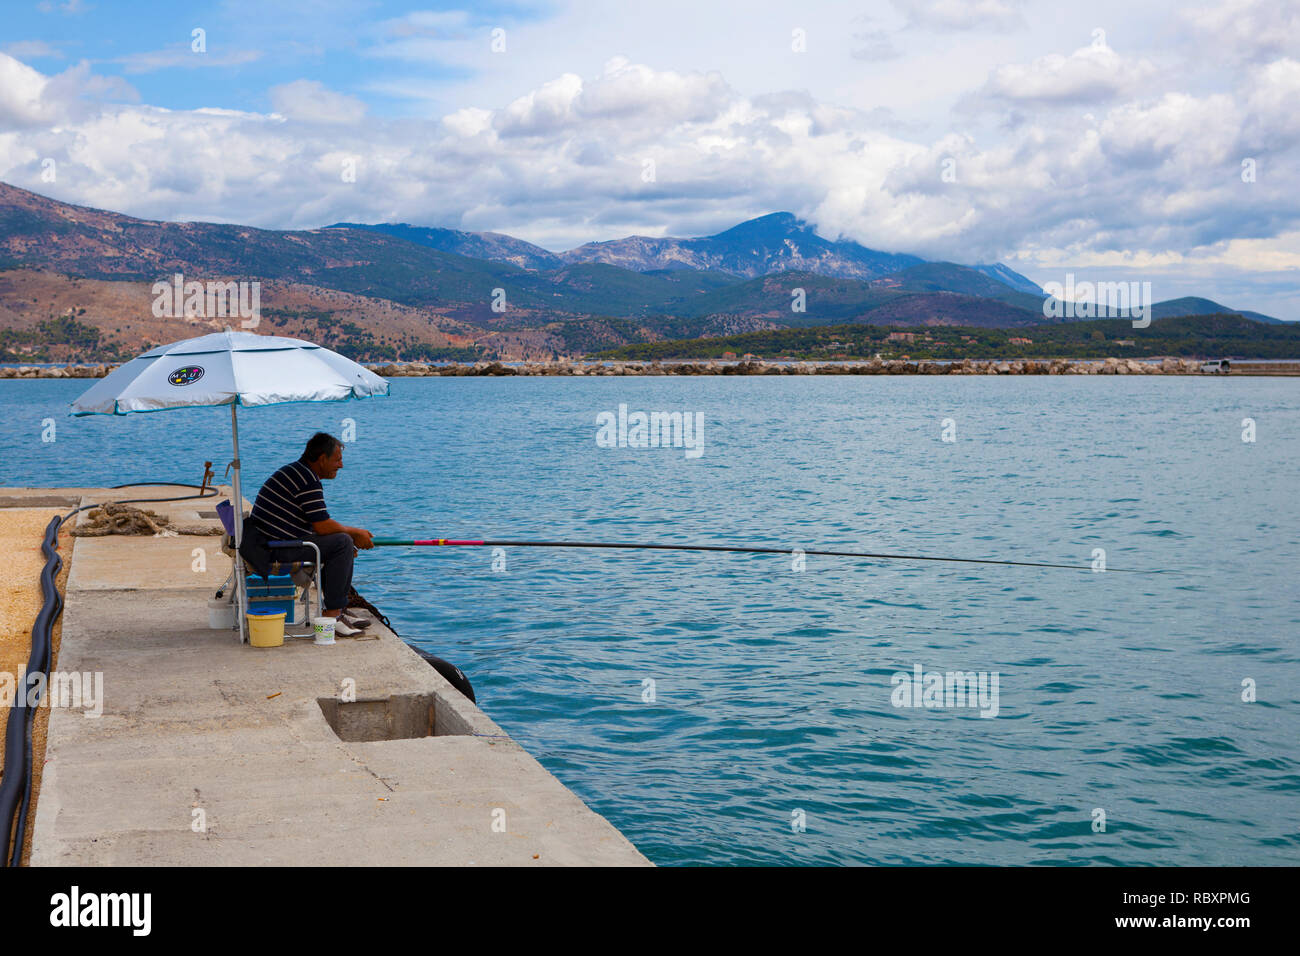 Greek angler at Lixouri, Kefalonia, Greece. - Stock Image